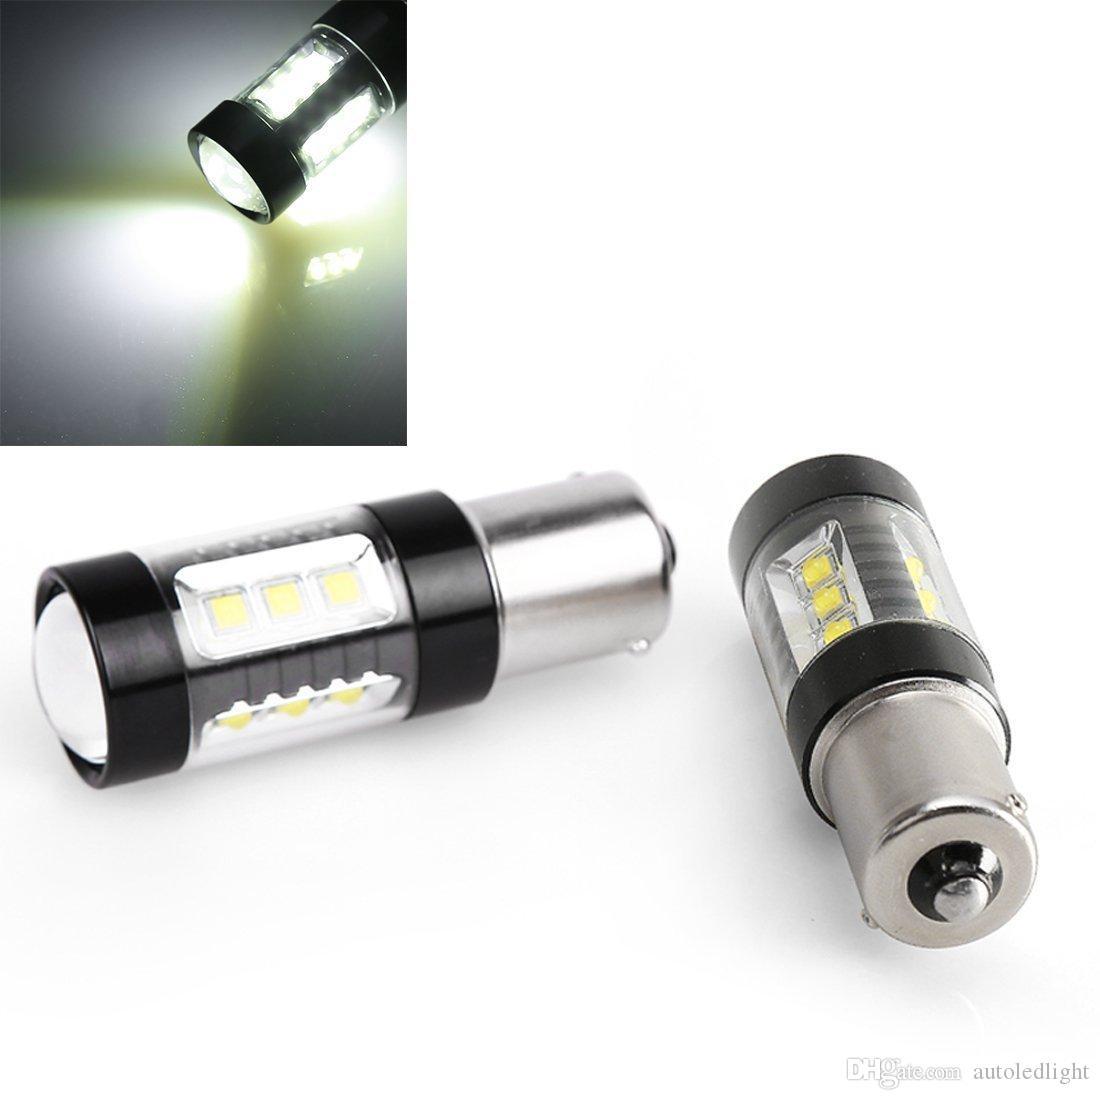 Auto LED Bulbs White H4 H7 9003 80W Projector Ultra Bright Headlight Beam High Power Car Fog Lights